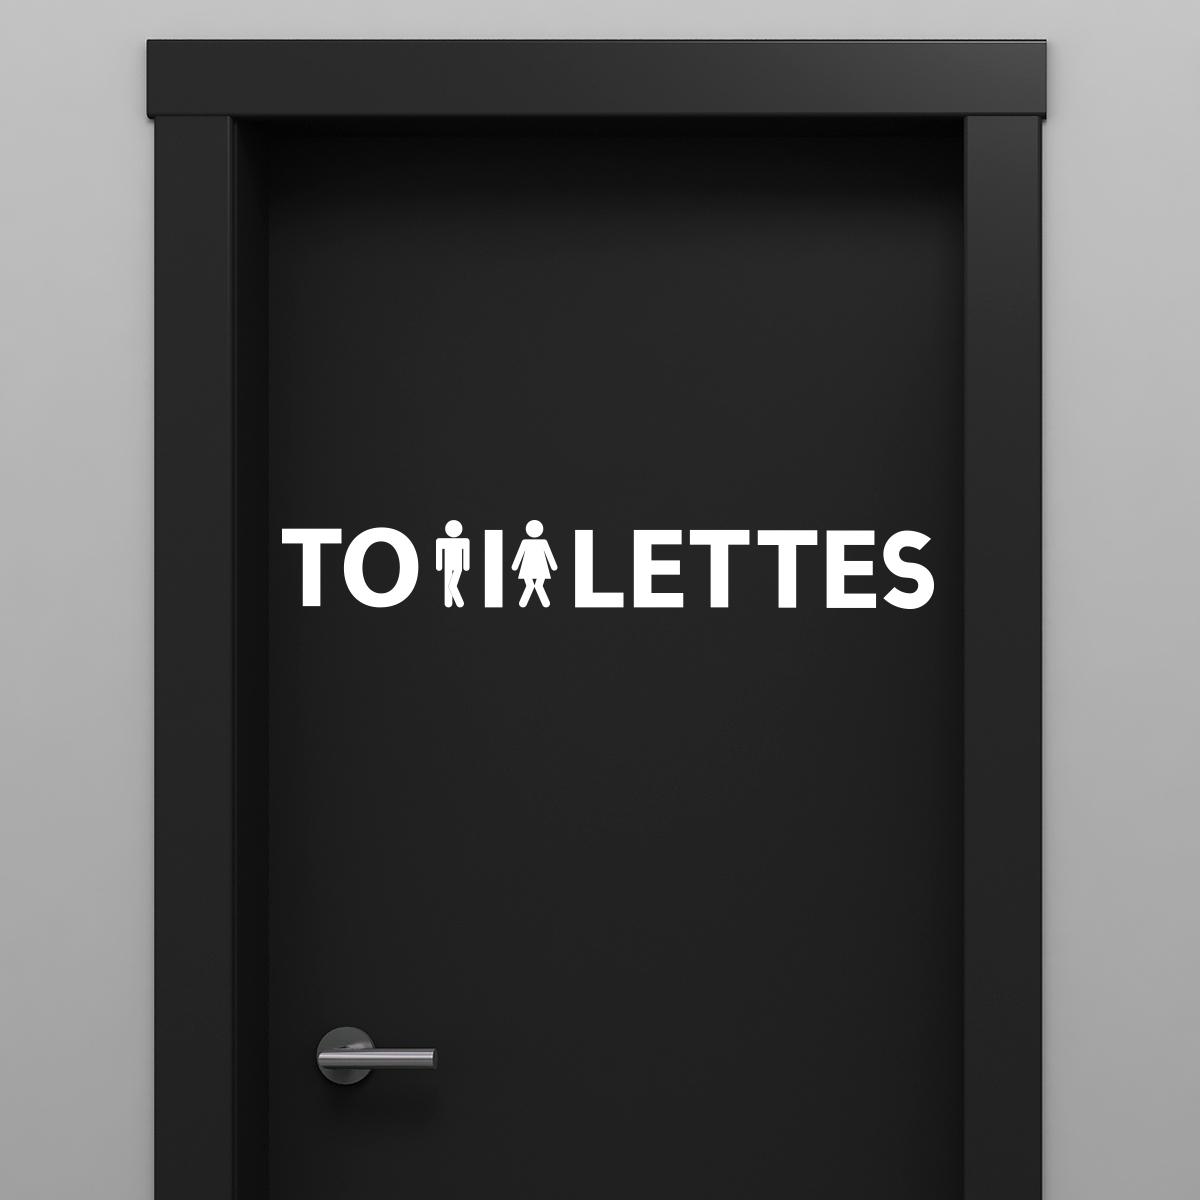 sticker porte toilettes femme et homme press s stickers. Black Bedroom Furniture Sets. Home Design Ideas